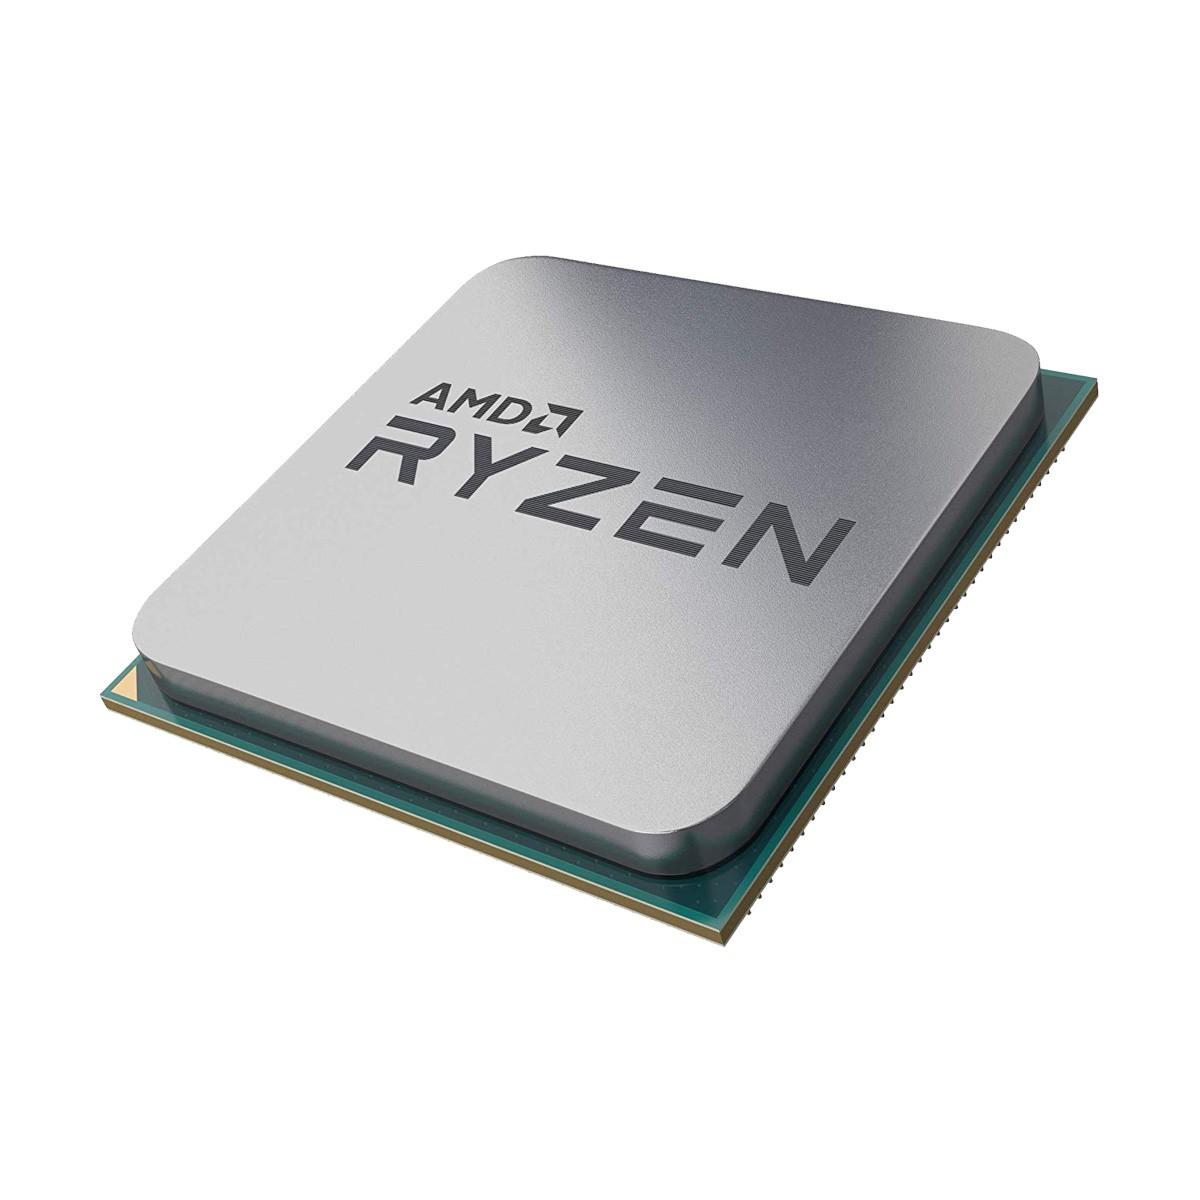 Amd Ryzen 5 2600x 3 6ghz 4 2ghz 6 Core 19mb Cache Am4 Socket Processor